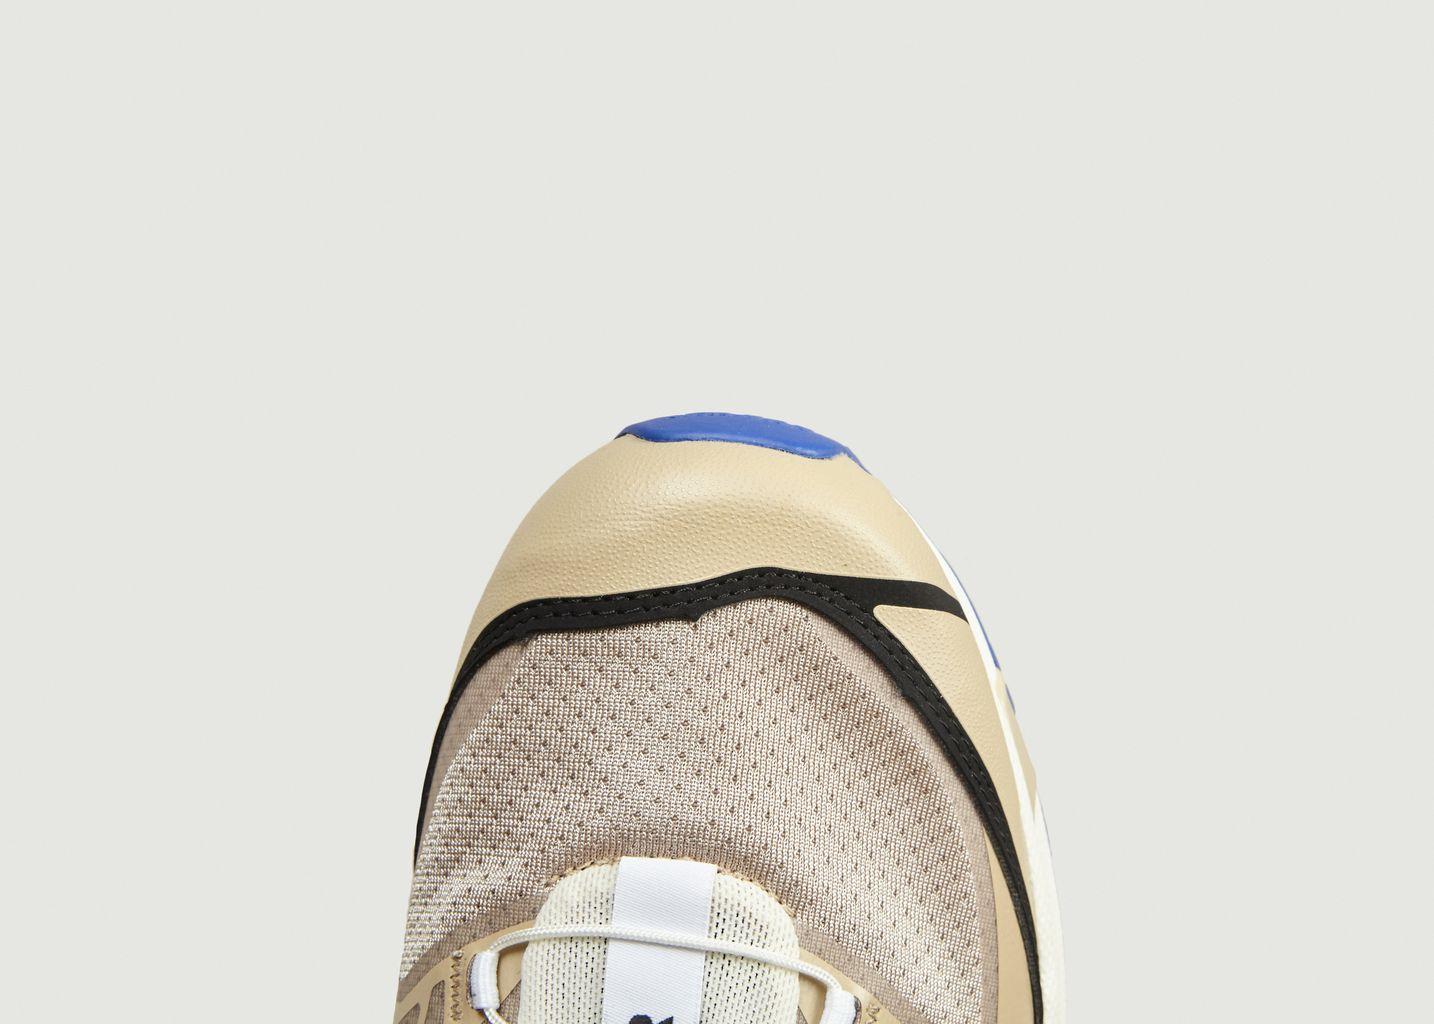 Sneakers Avnier x Salomon S/LAB XT-5 - AVNIER